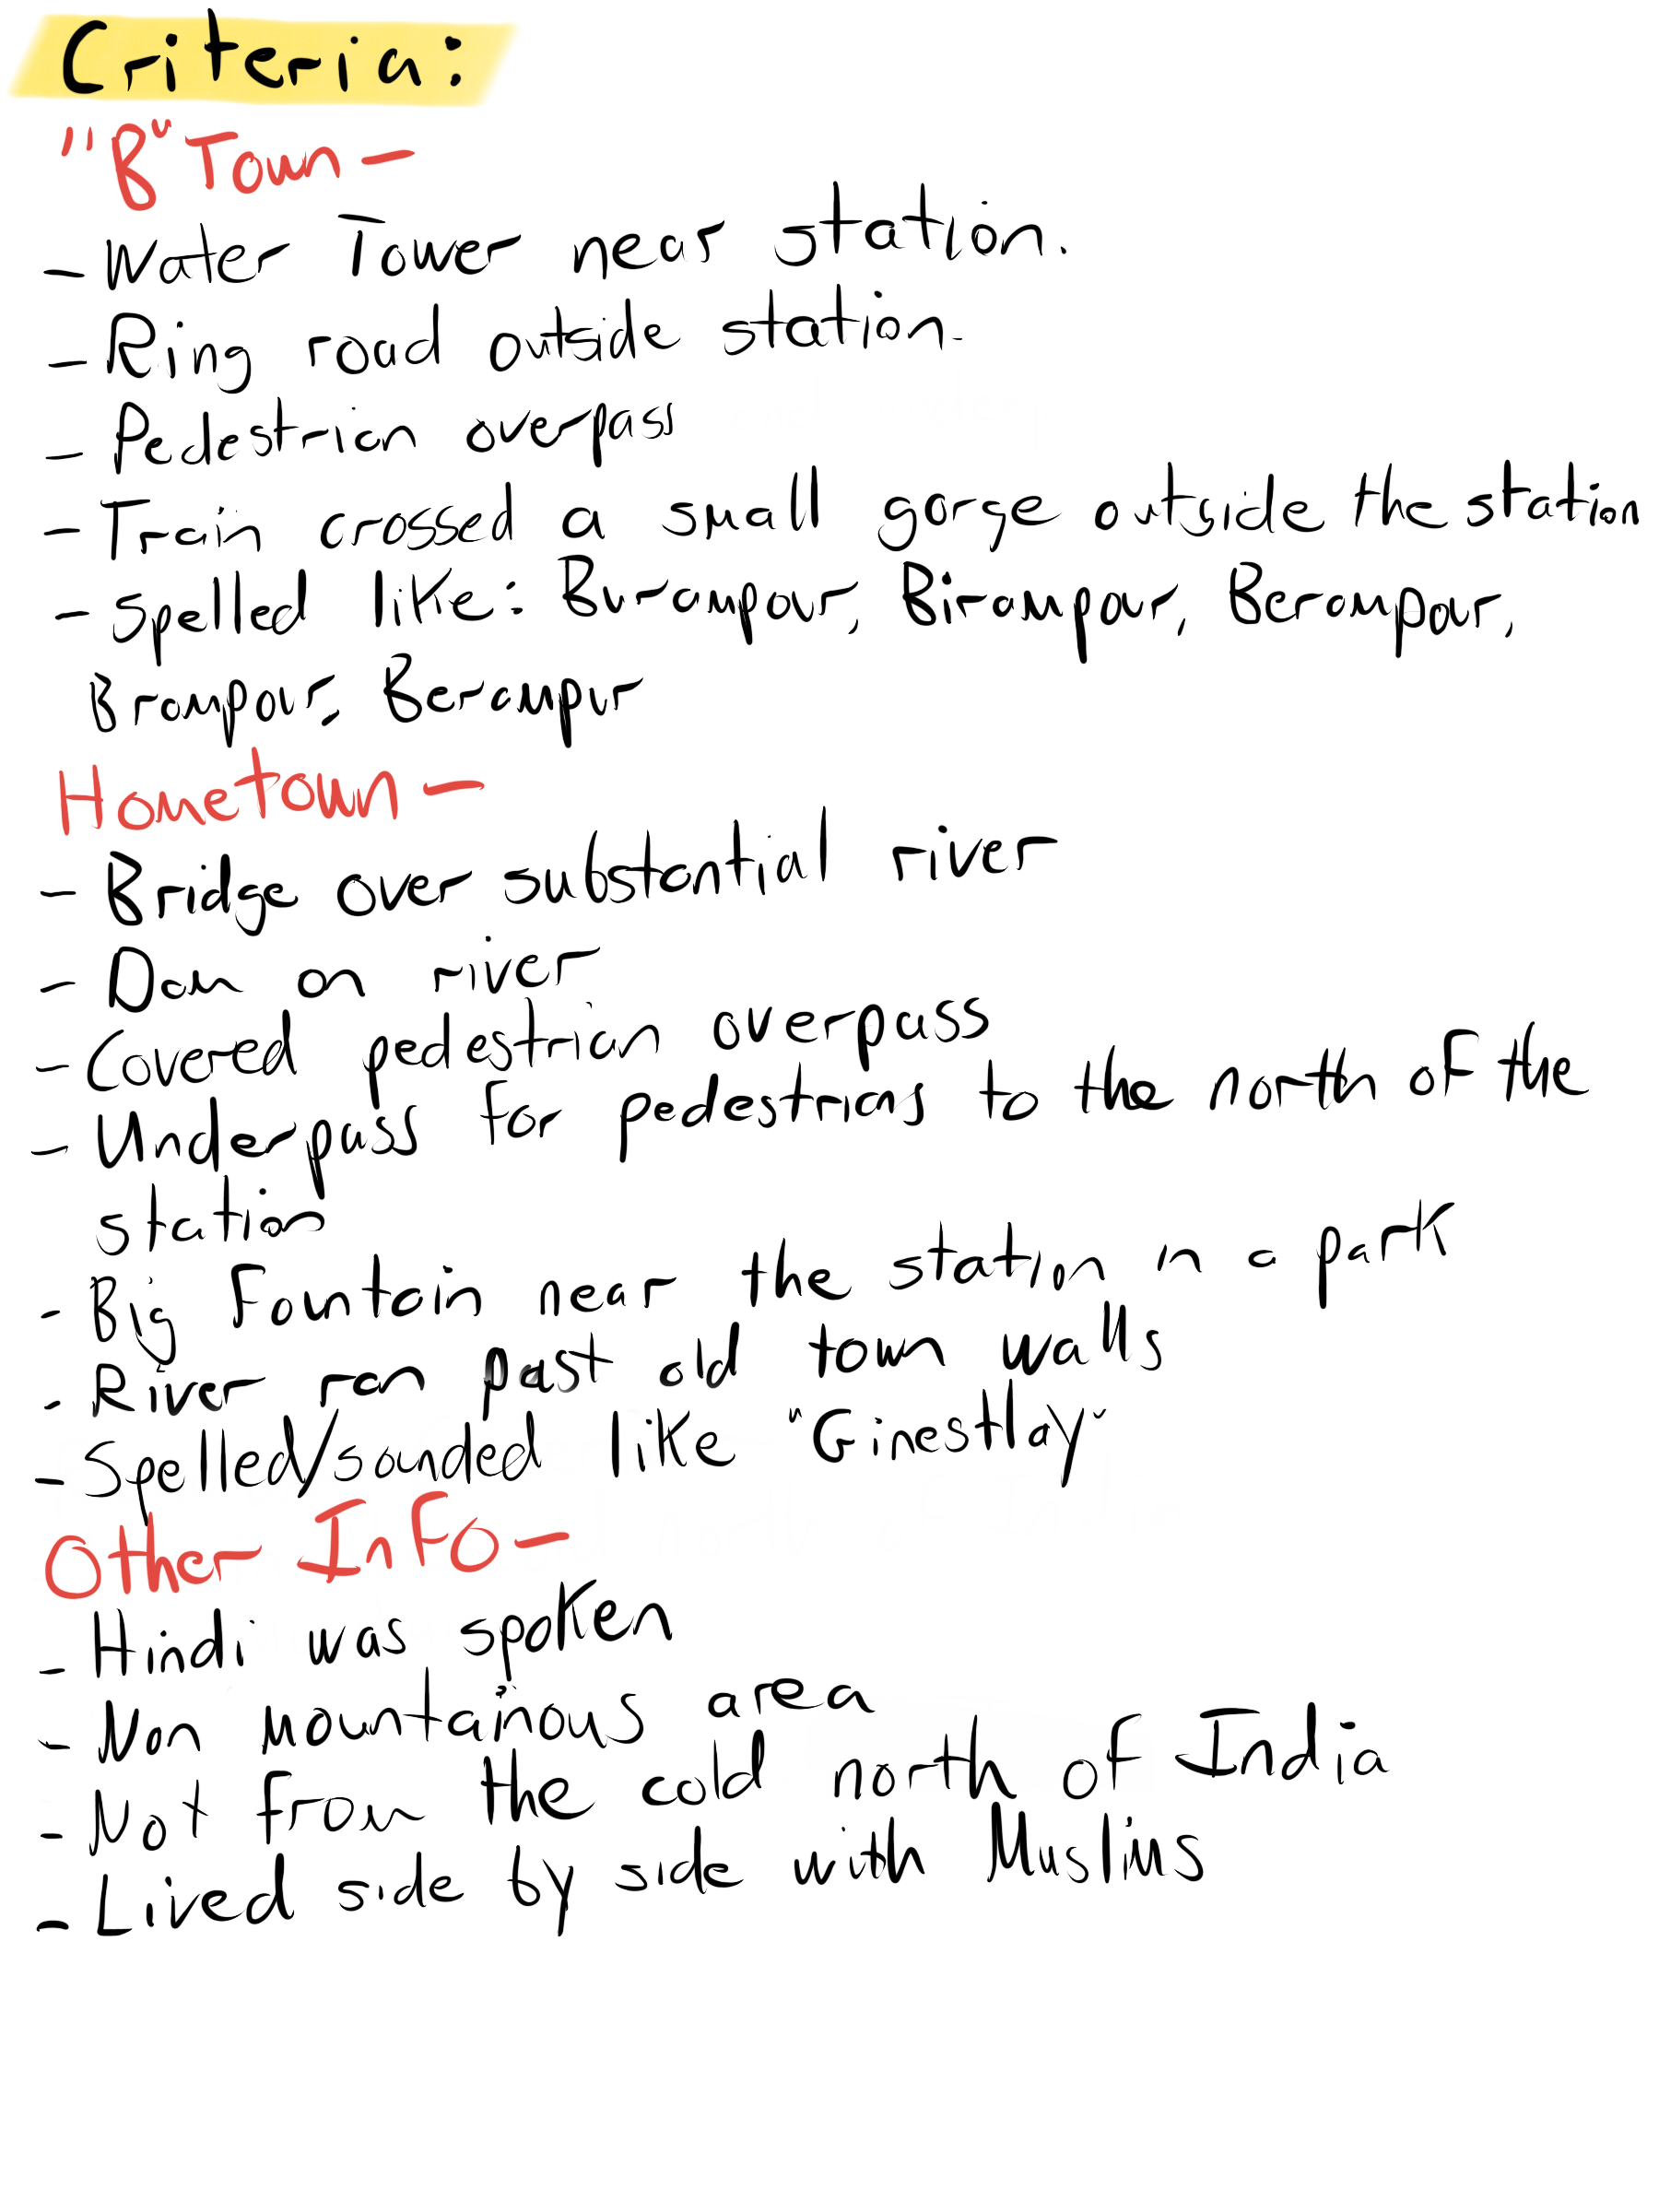 Initial Search Criteria